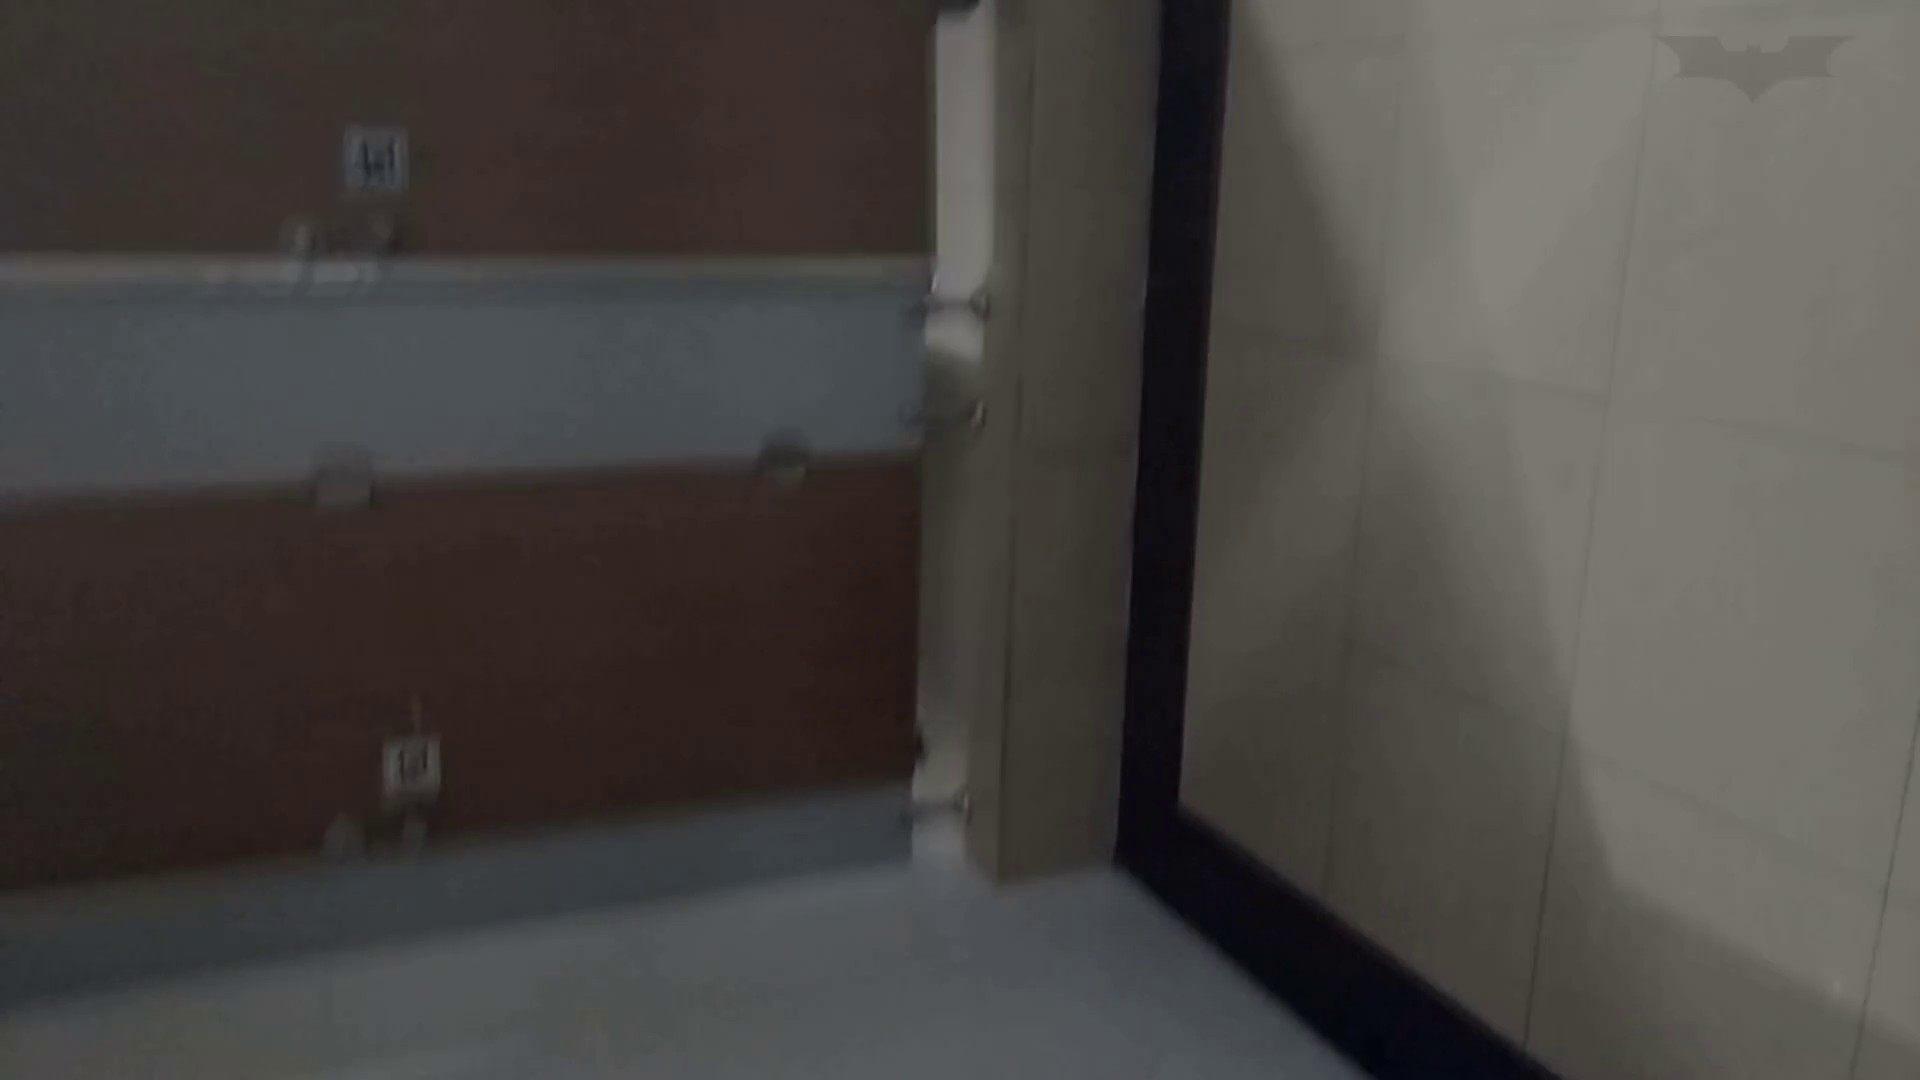 芸術大学ガチ潜入盗撮 JD盗撮 美女の洗面所の秘密 Vol.98 潜入 セックス無修正動画無料 67pic 52